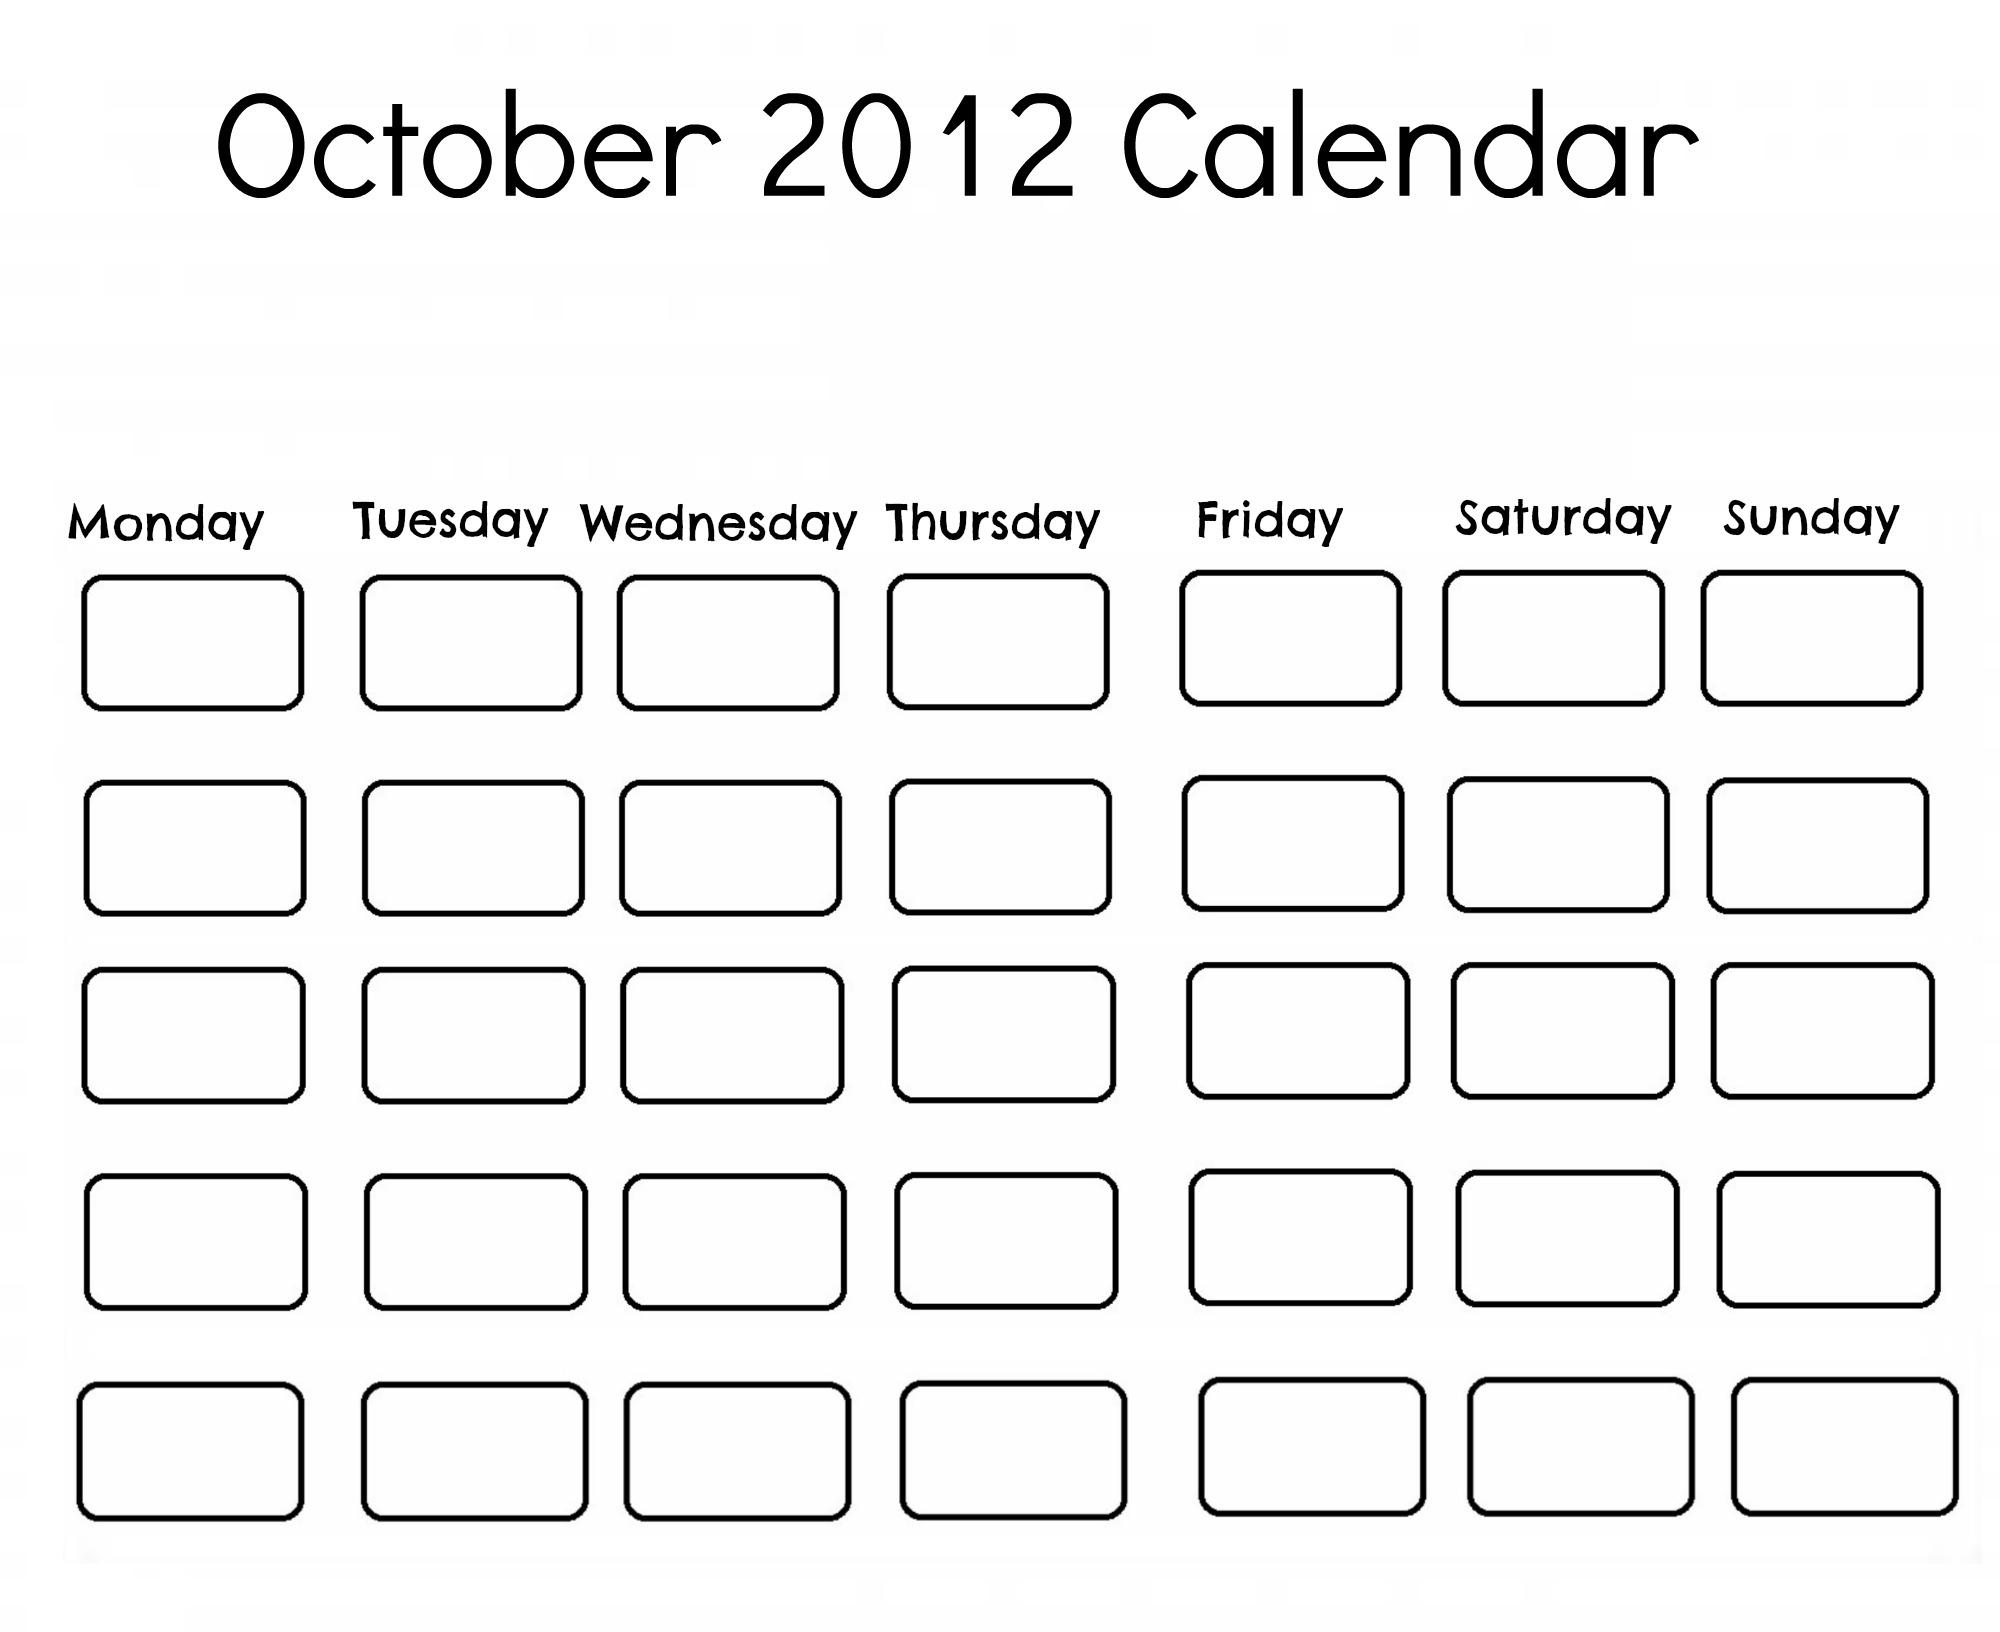 October 2012 Calendar Free printable 2012 calendars